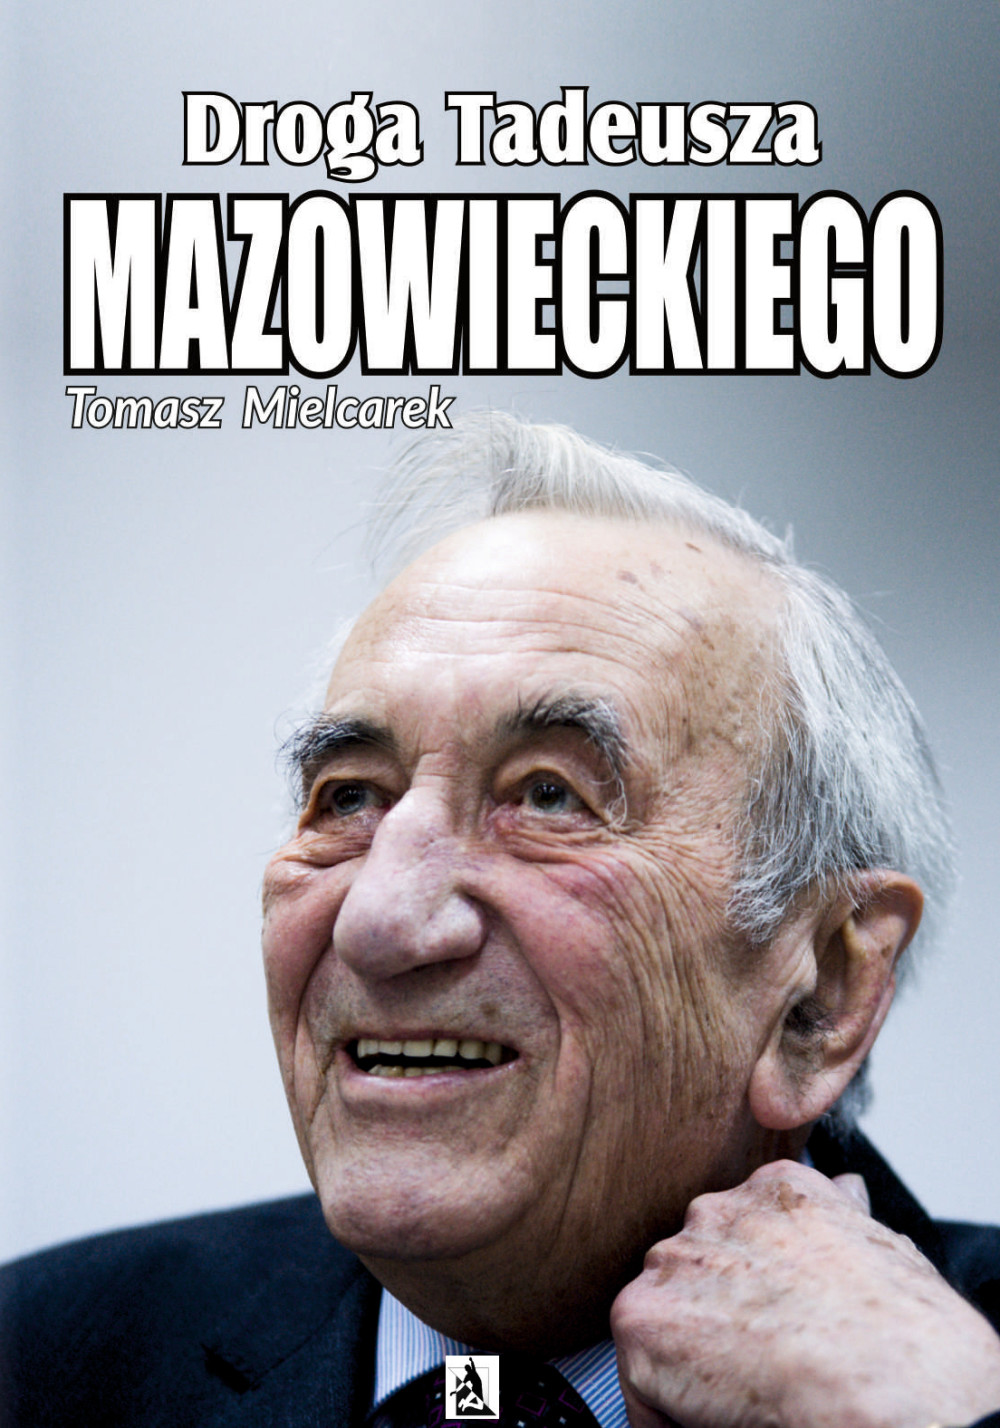 :: Droga Tadeusza Mazowieckiego - e-book ::